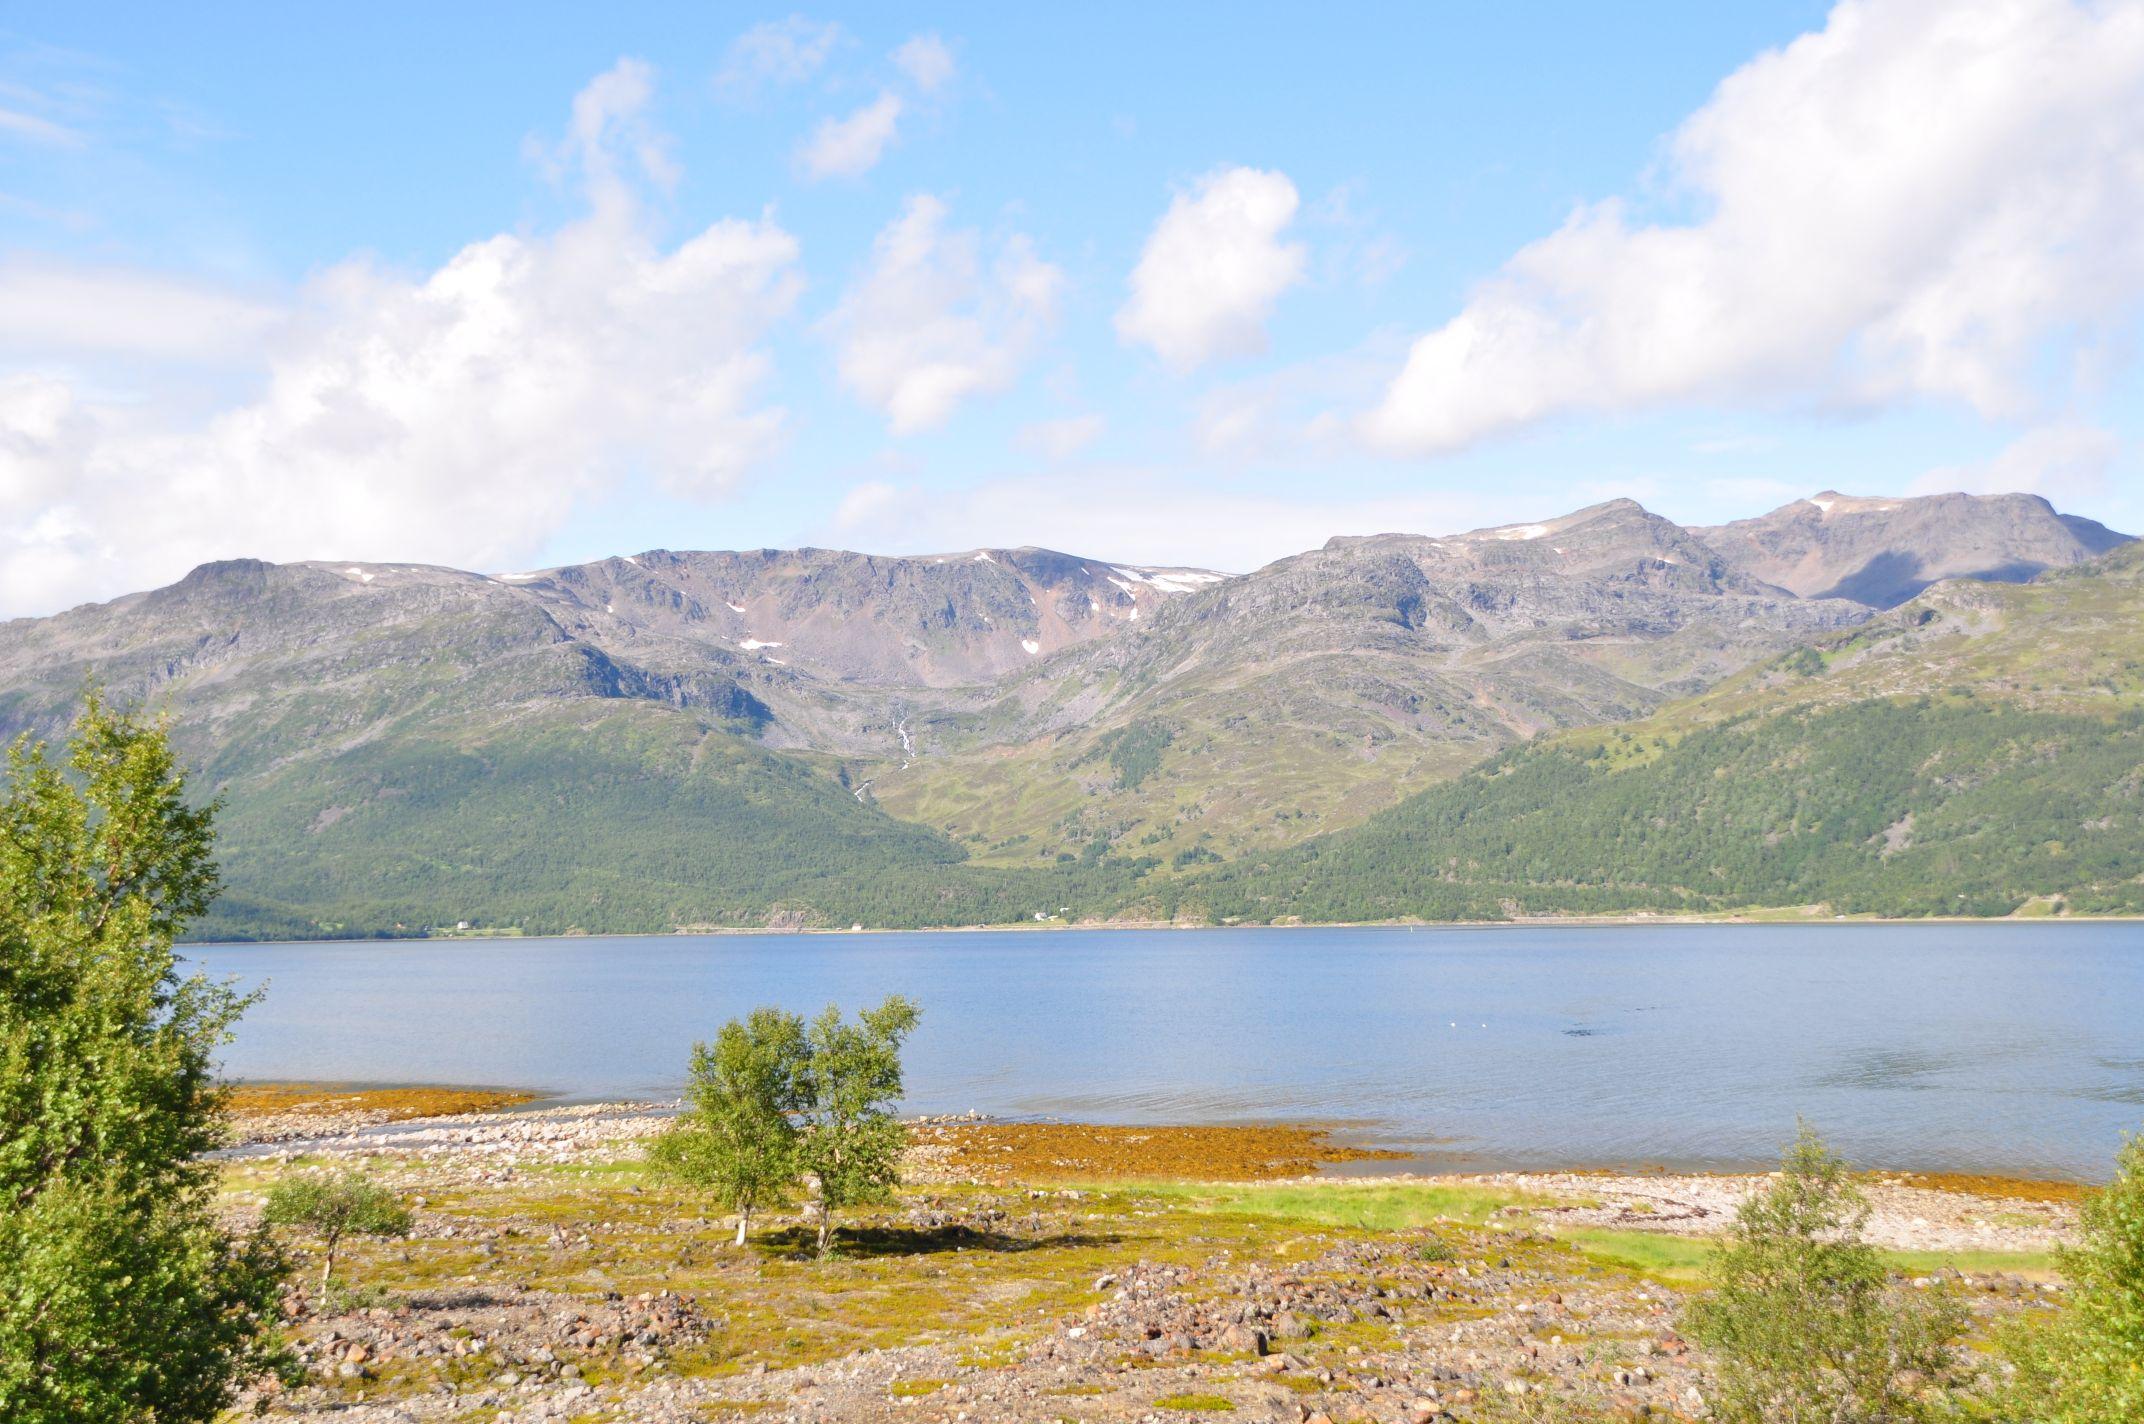 Ausblick vom Campingplatz